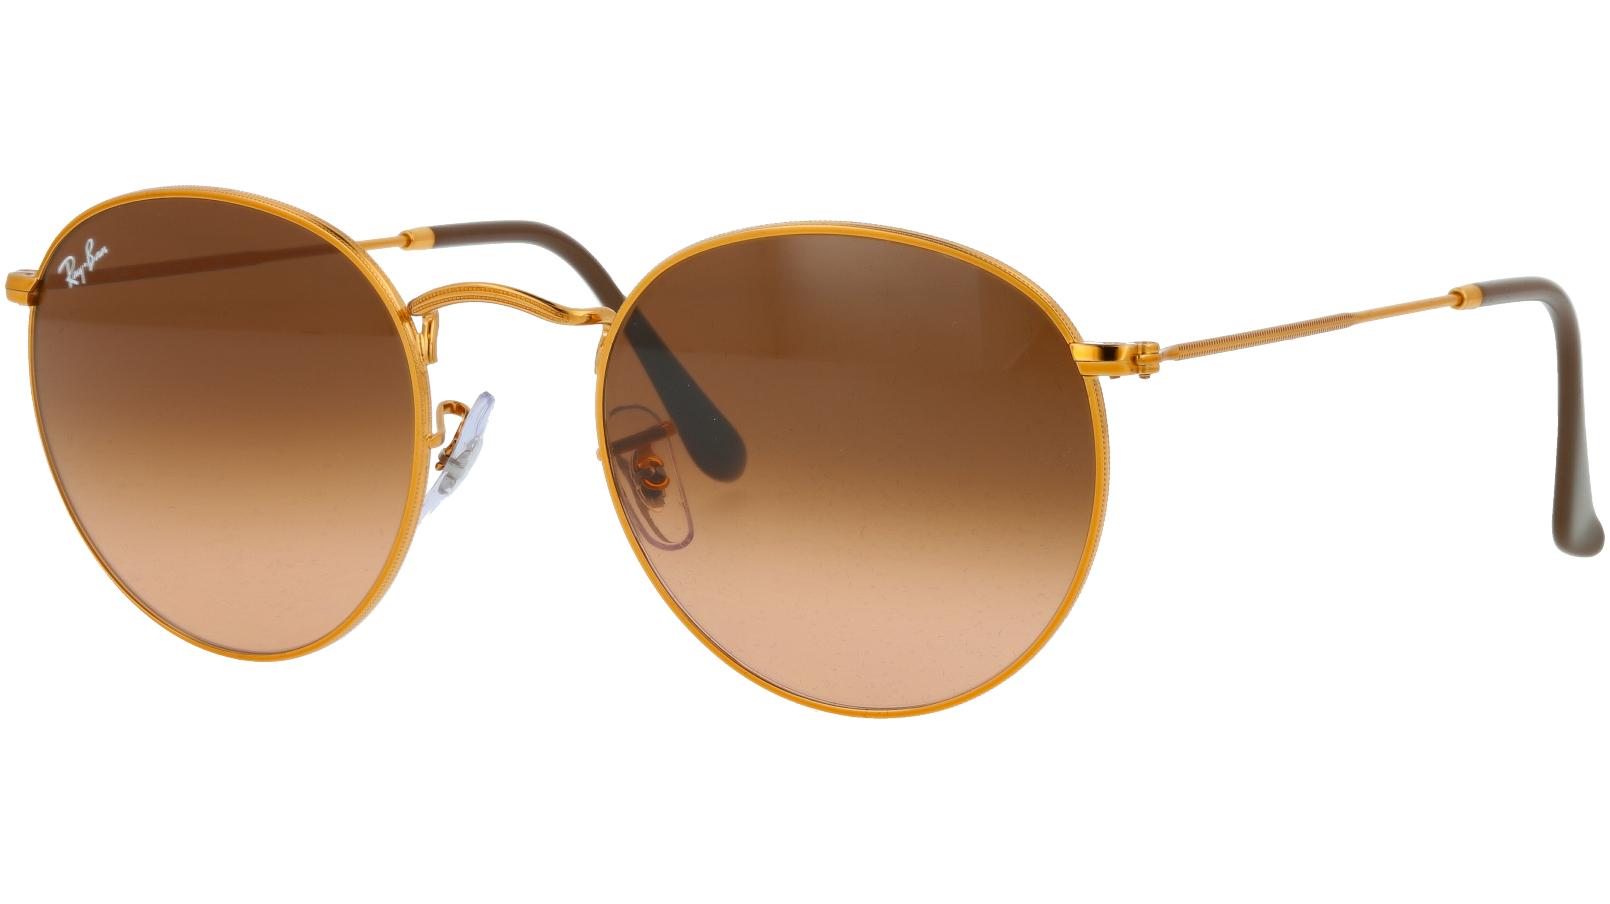 Ray-Ban RB3447 9001A5 53 Light Bronze Sunglasses